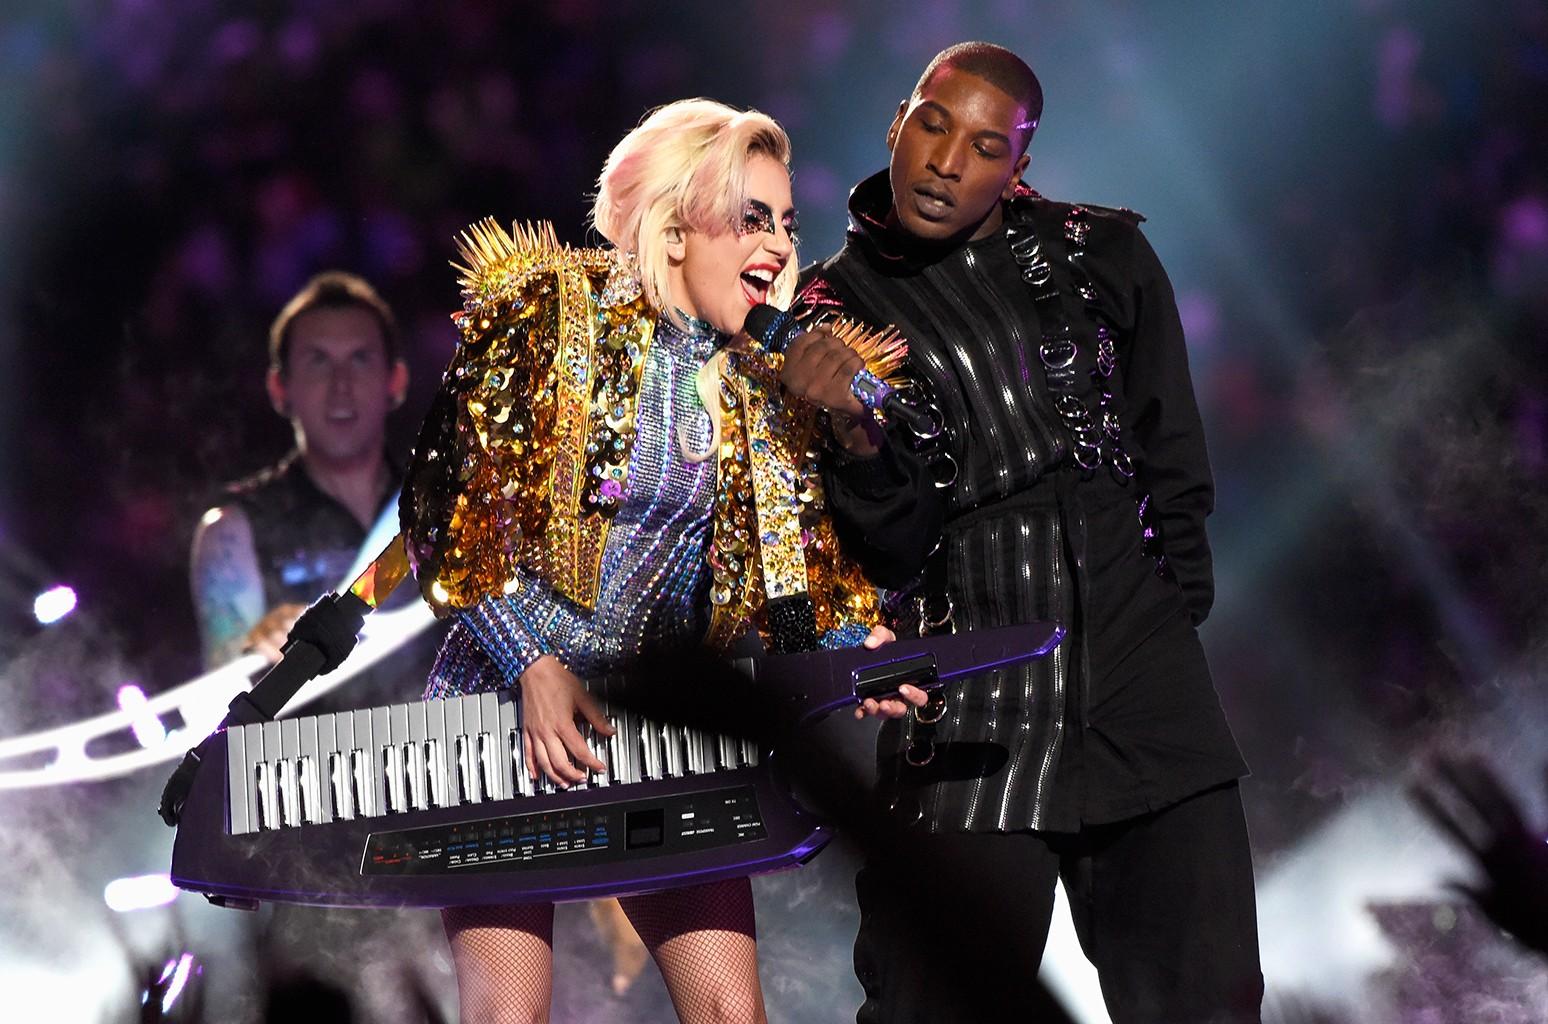 Lady Gaga performs during the Pepsi Zero Sugar Super Bowl LI Halftime Show at NRG Stadium on Feb. 5, 2017 in Houston.